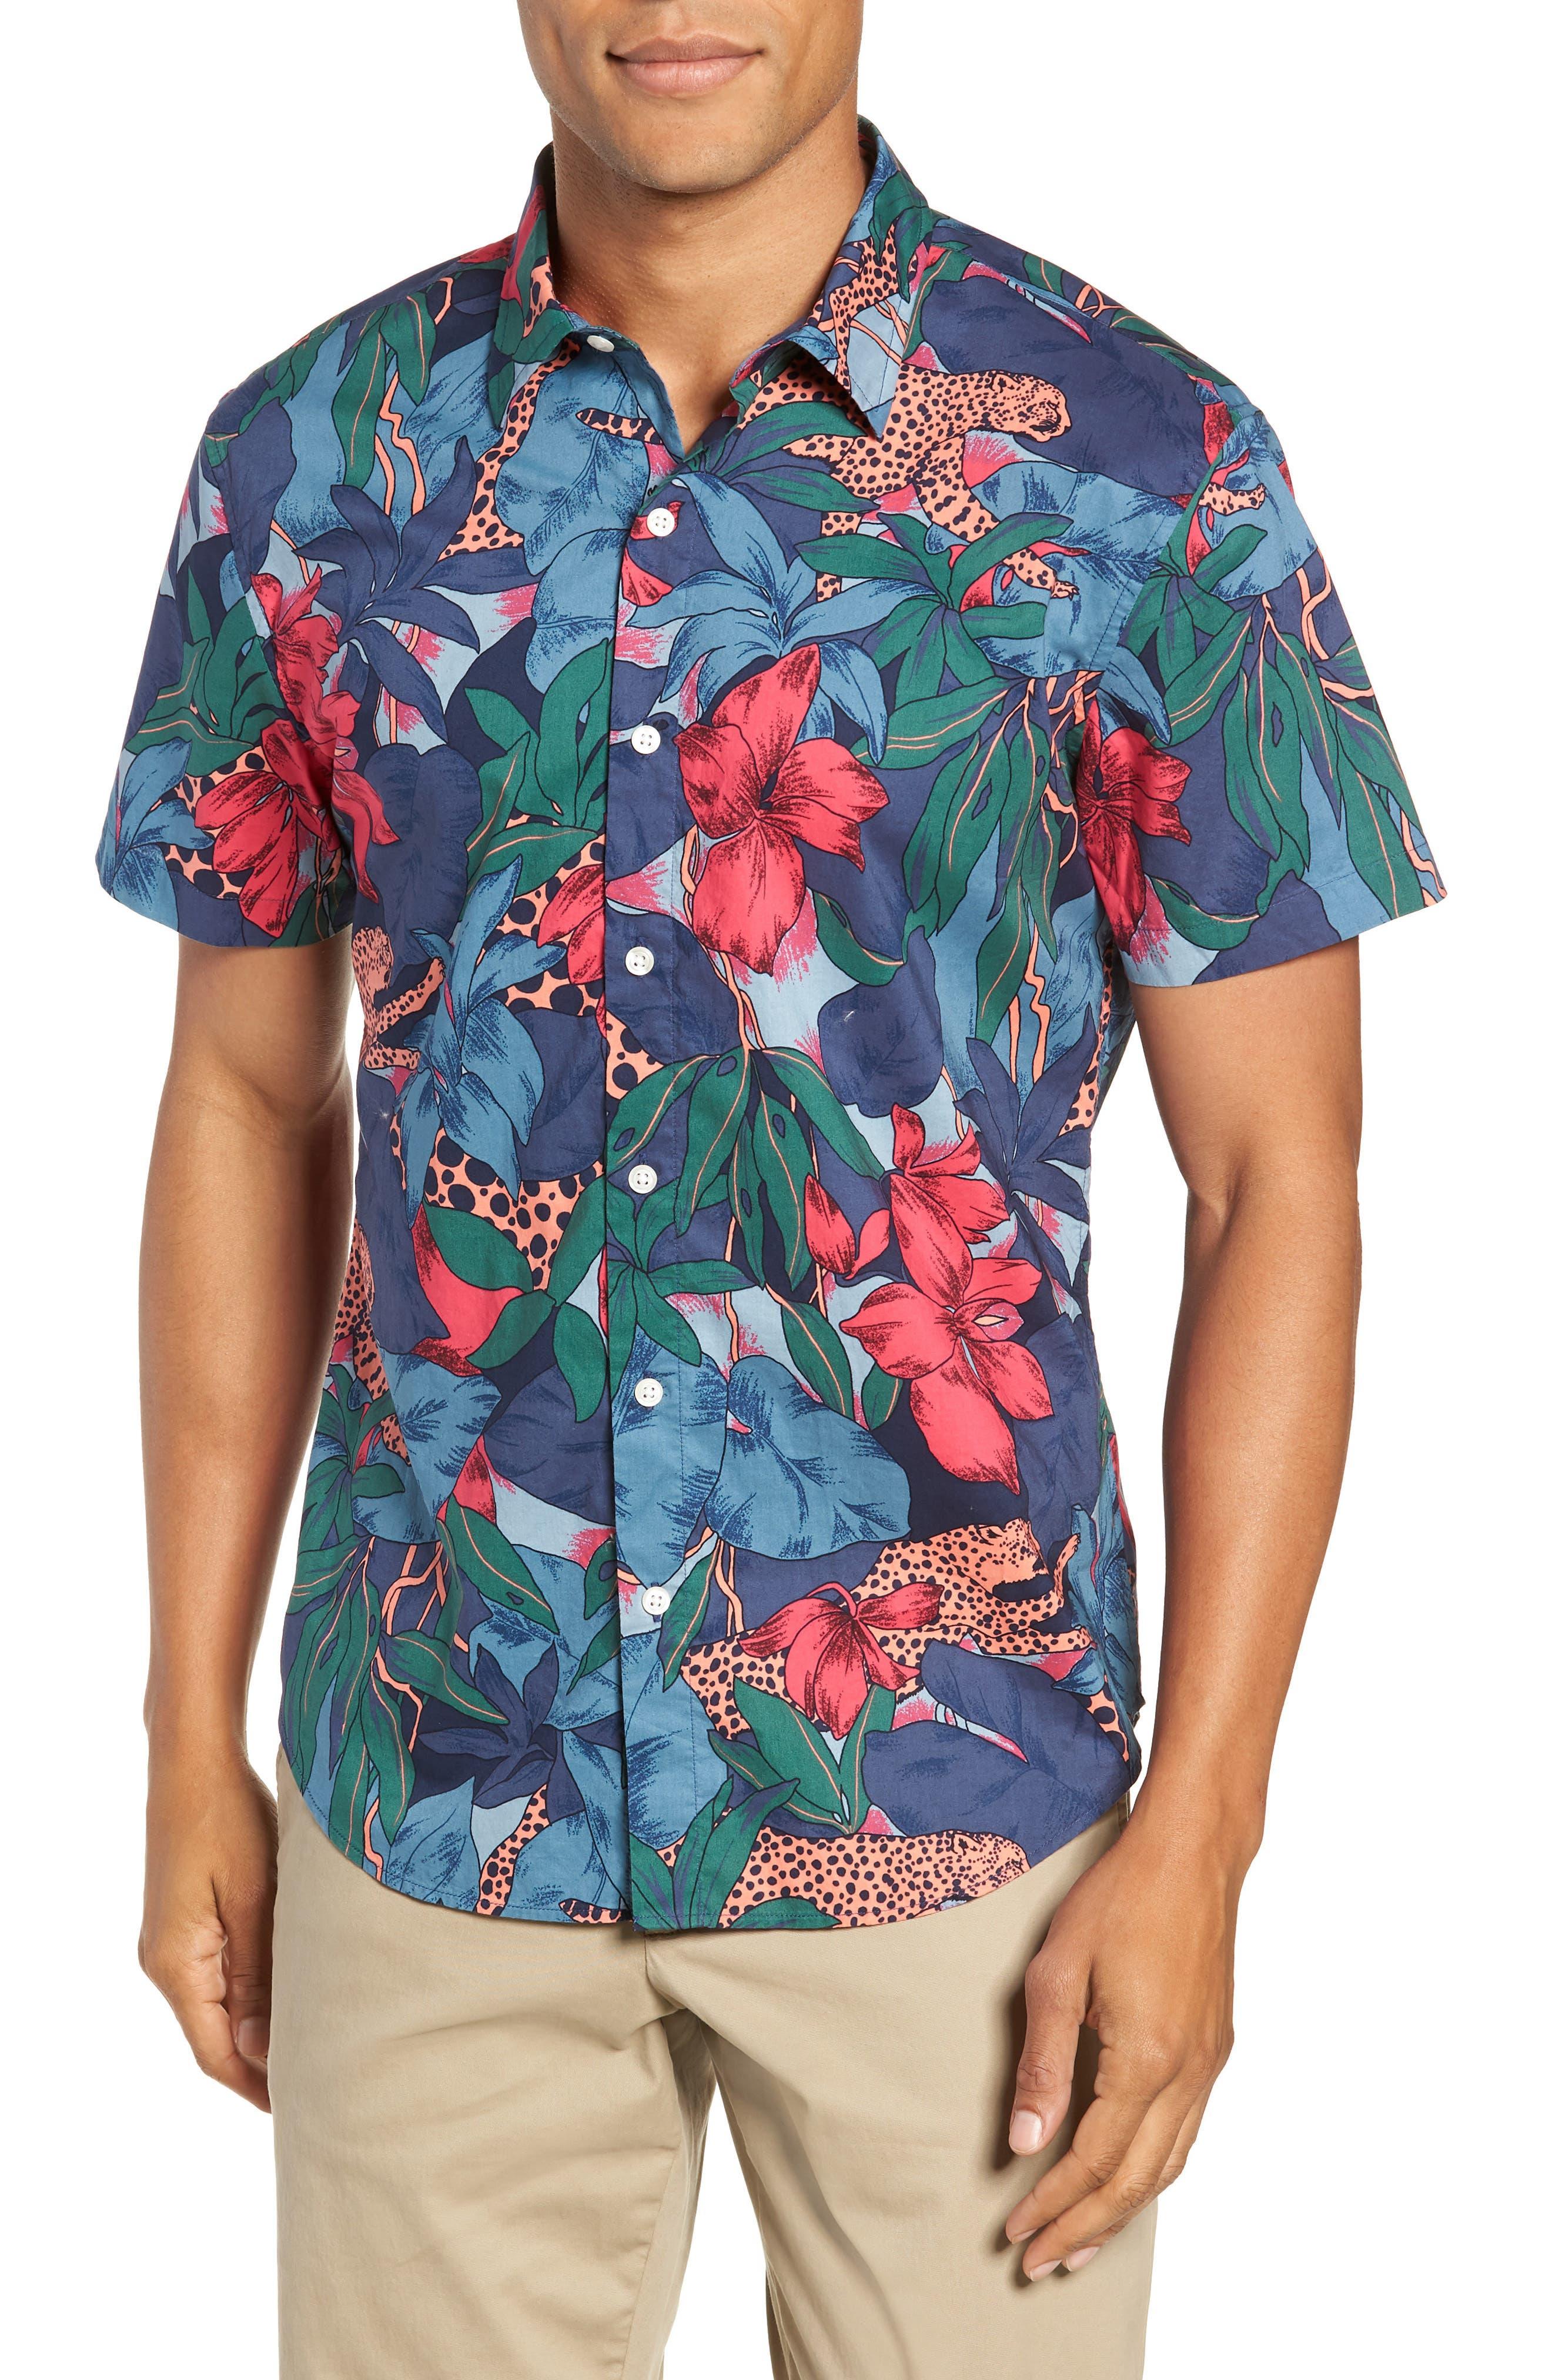 Riviera Slim Fit Leopard Floral Sport Shirt,                             Main thumbnail 1, color,                             WILD CATS - PEACH TWIG